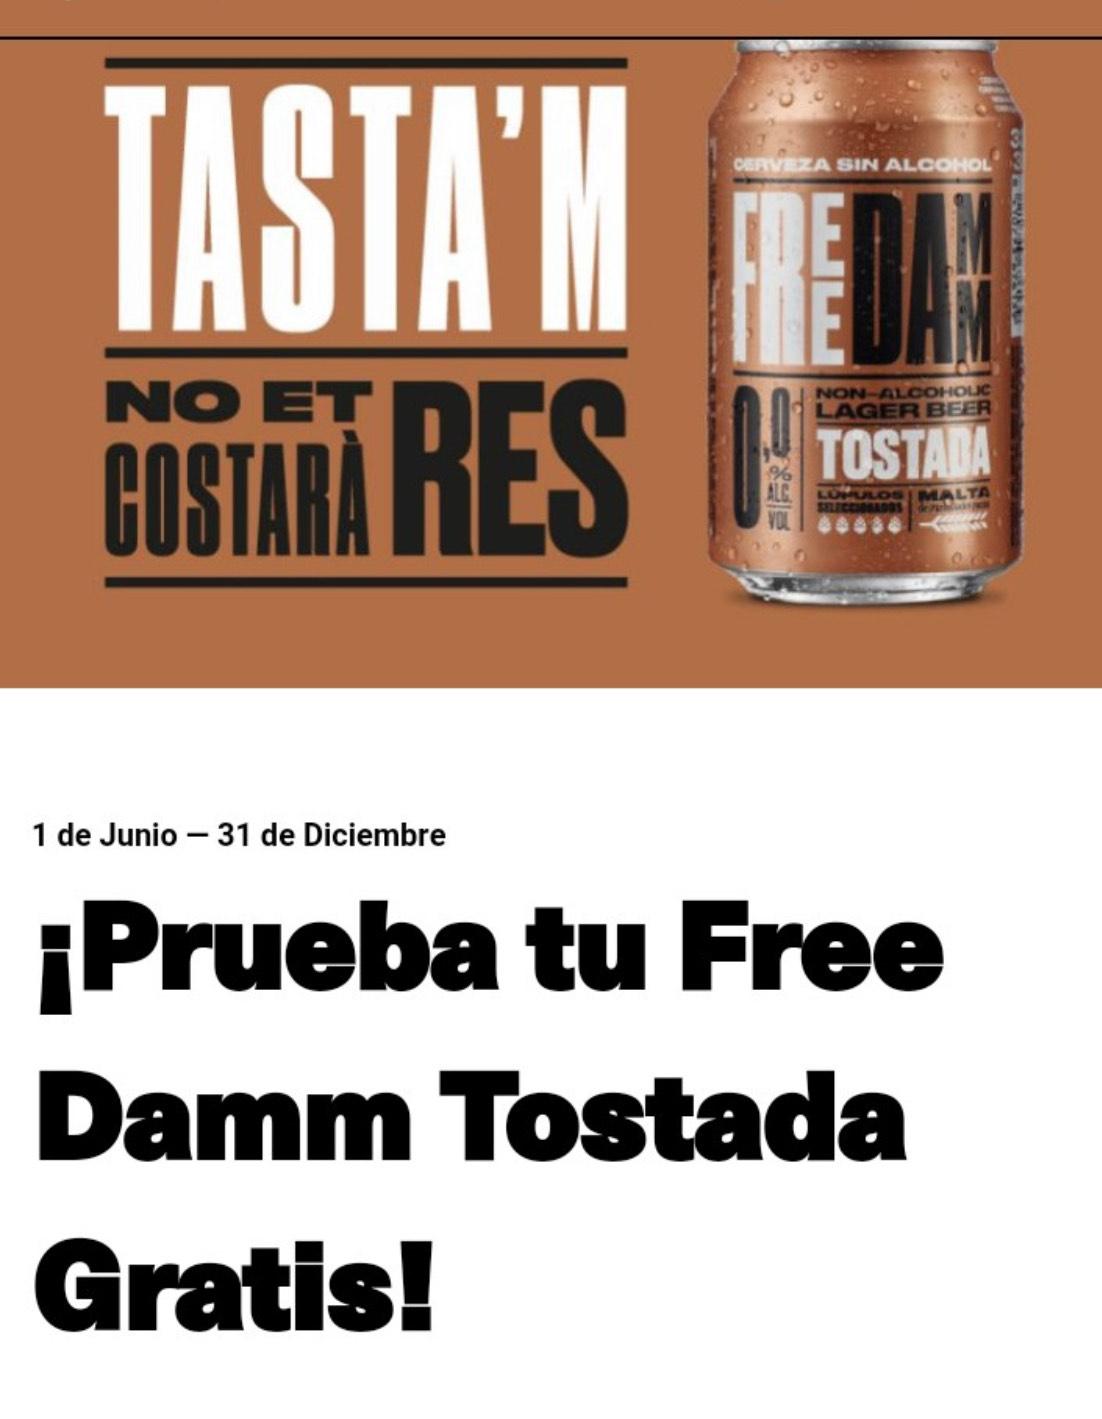 Prueba cerveza Free Damm Tostada Gratis (Reembolso)